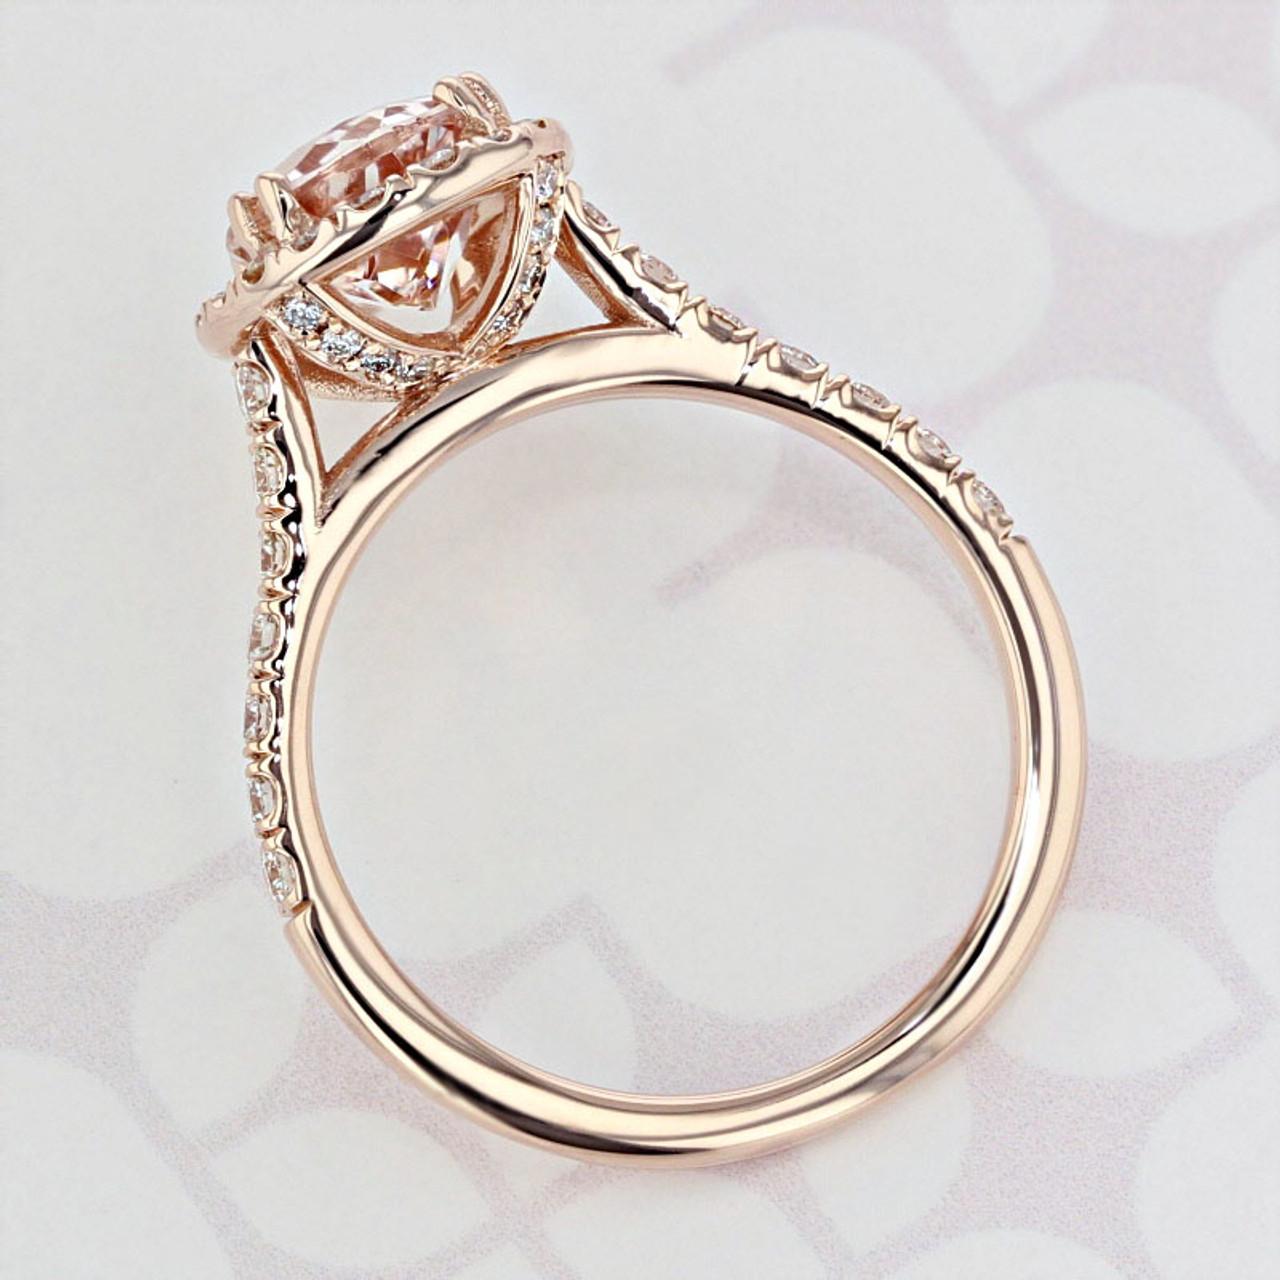 Halo Pear Shape Morganite Engagement Ring 2006054